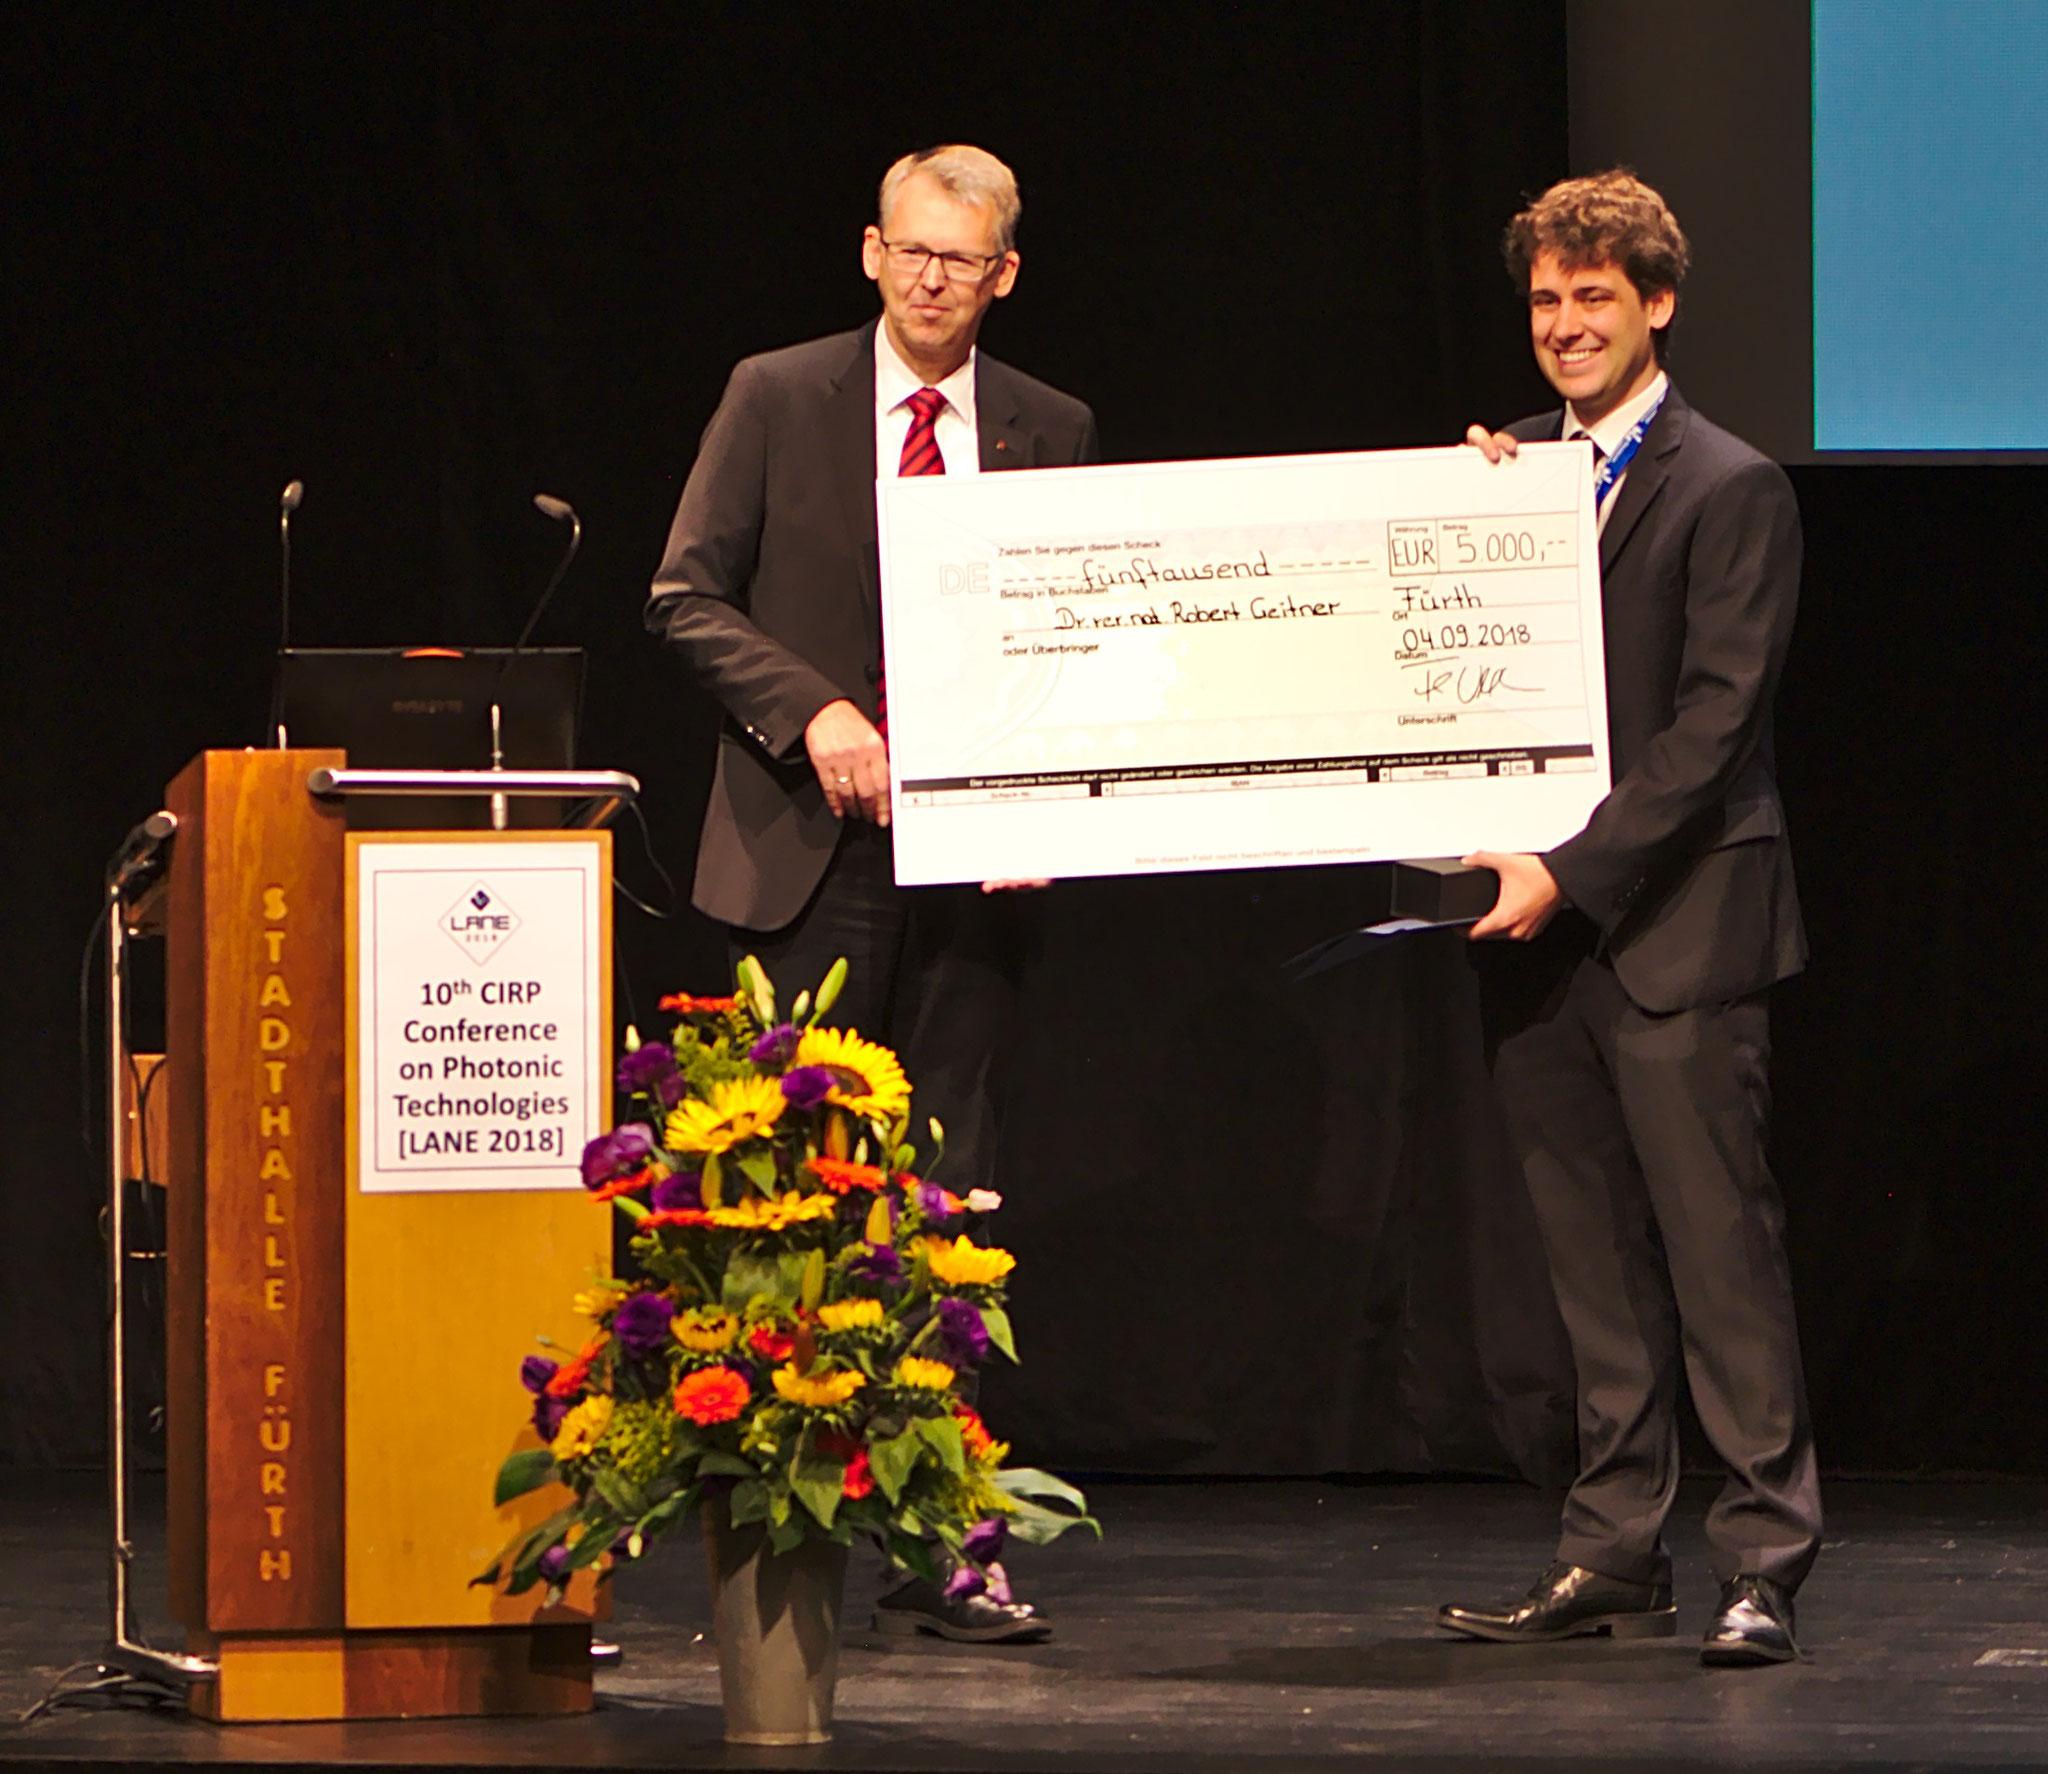 Prof. Frank Vollertsen from BIAS – Bremer Institut für angewandte Strahltechnik GmbH (left) and Dr. Robert Geitner from Utrecht University (right) during the ceremony for the Award of the Scientific Society for Laser Technology (WLT e.V.)